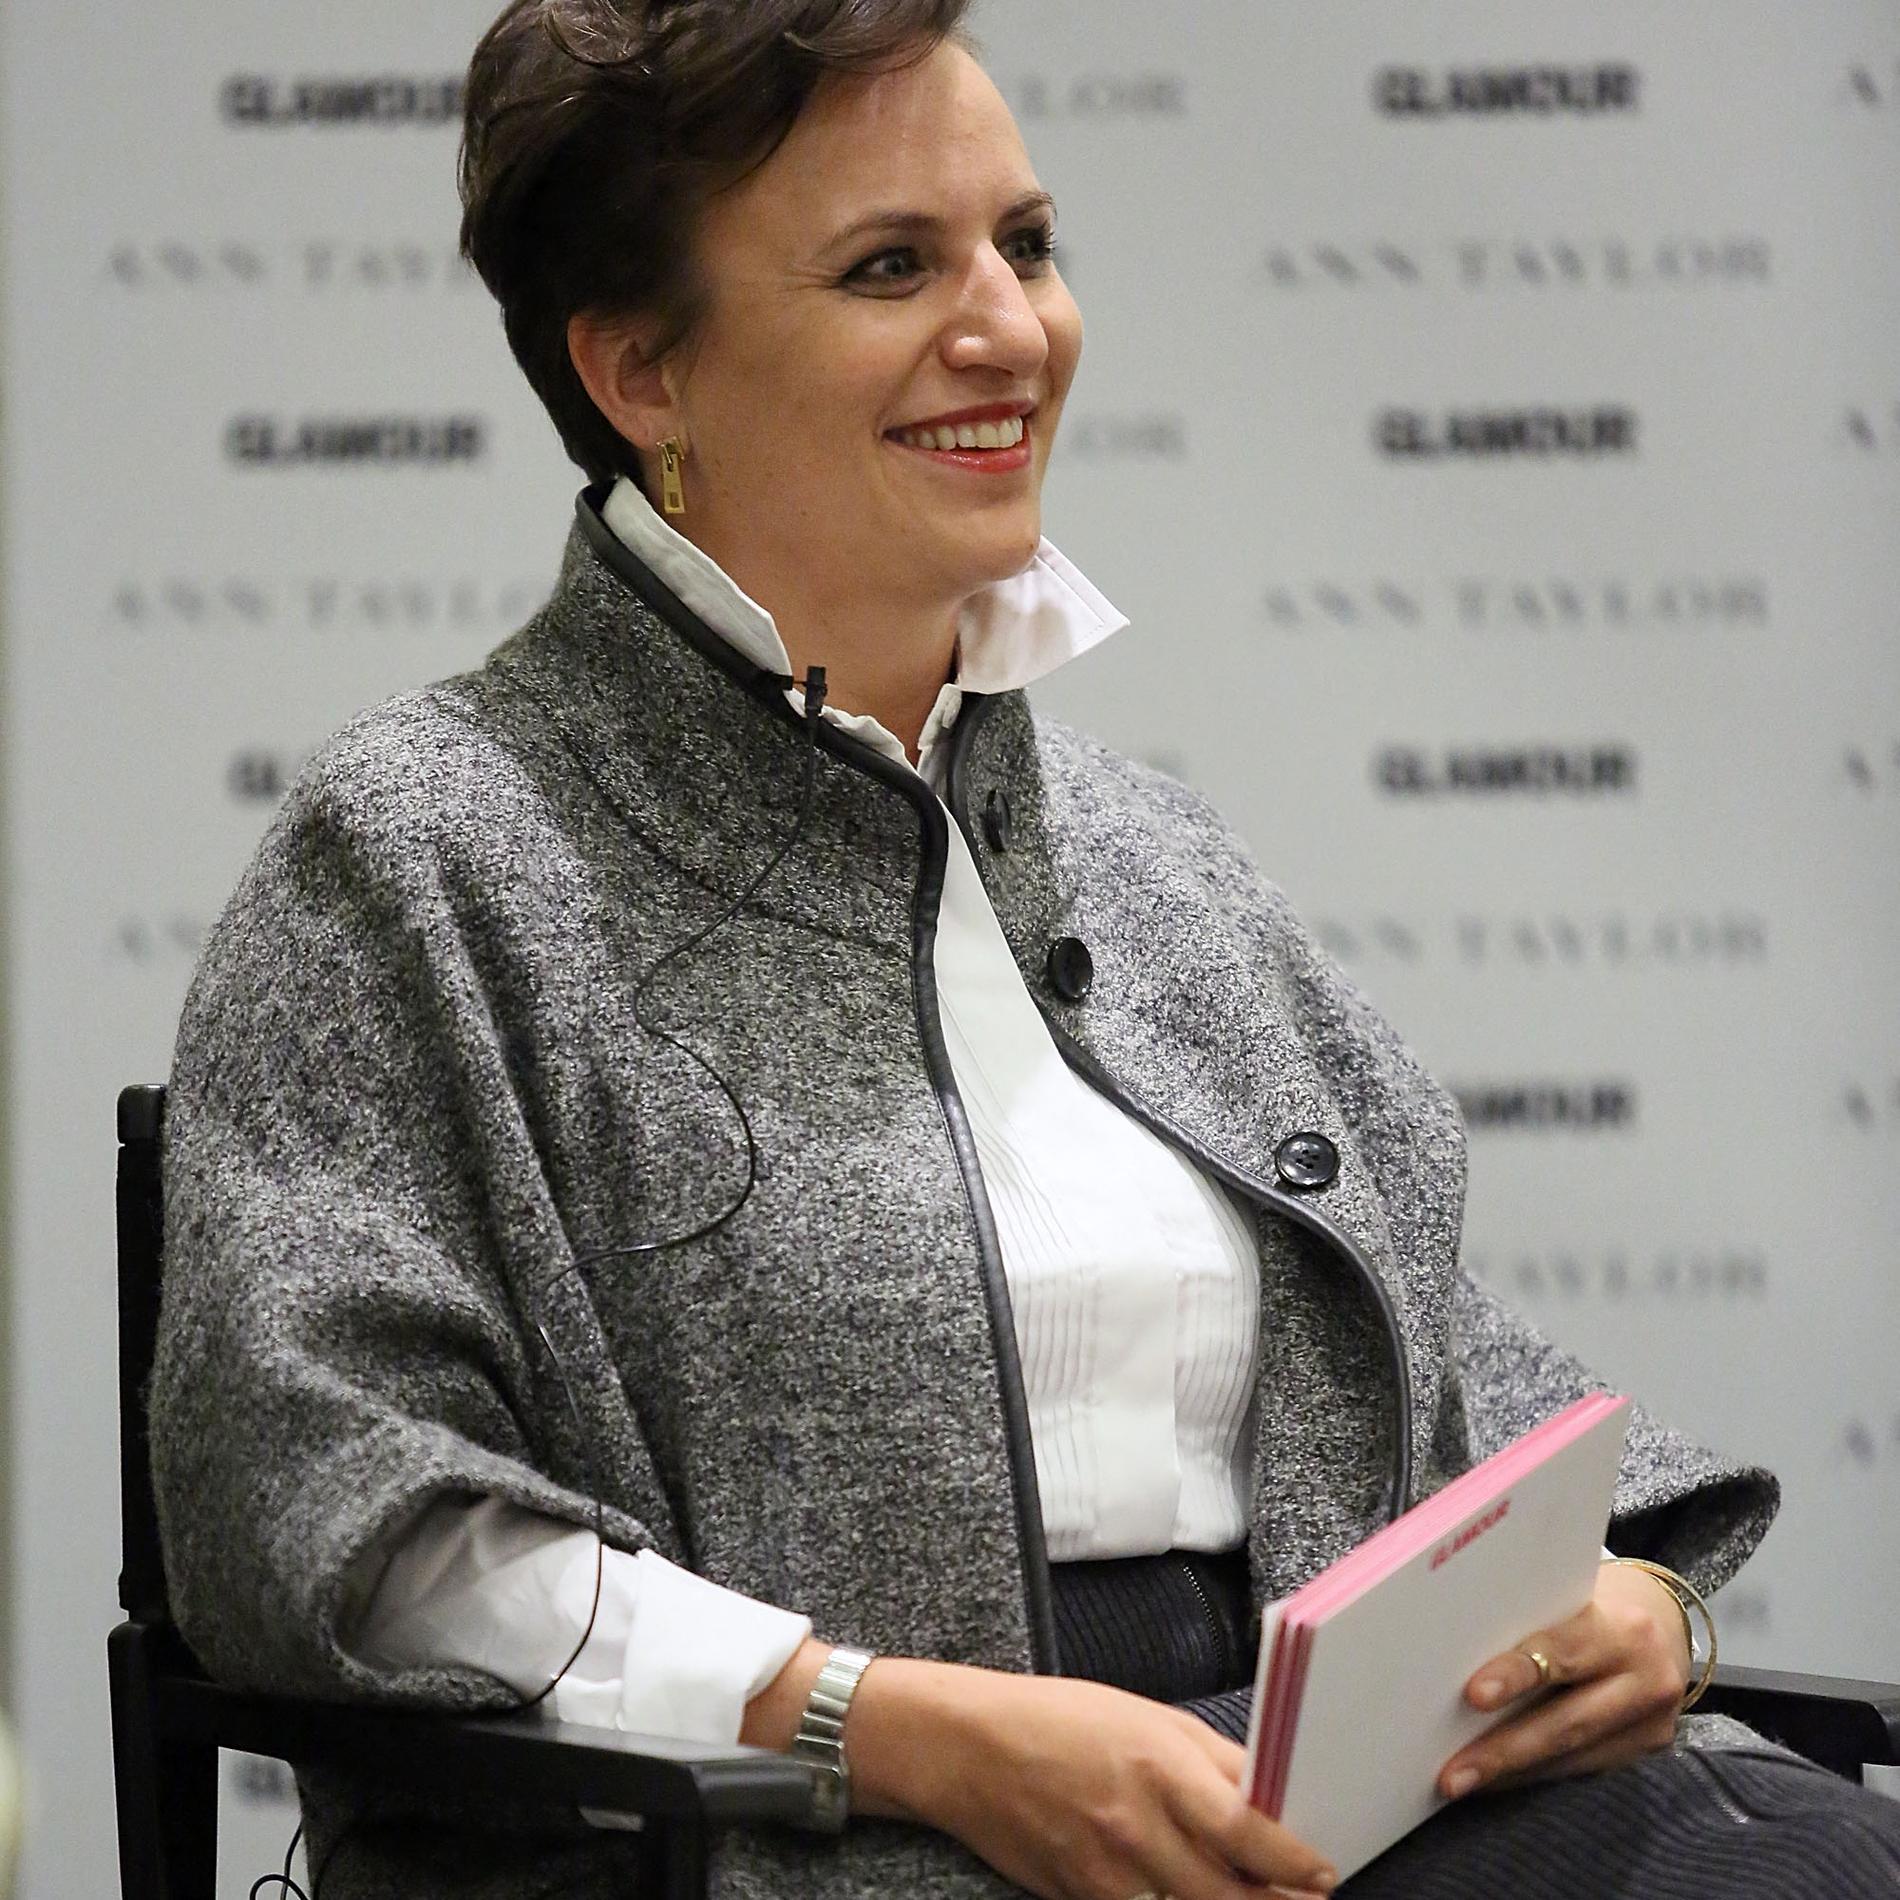 Geneviève Roth